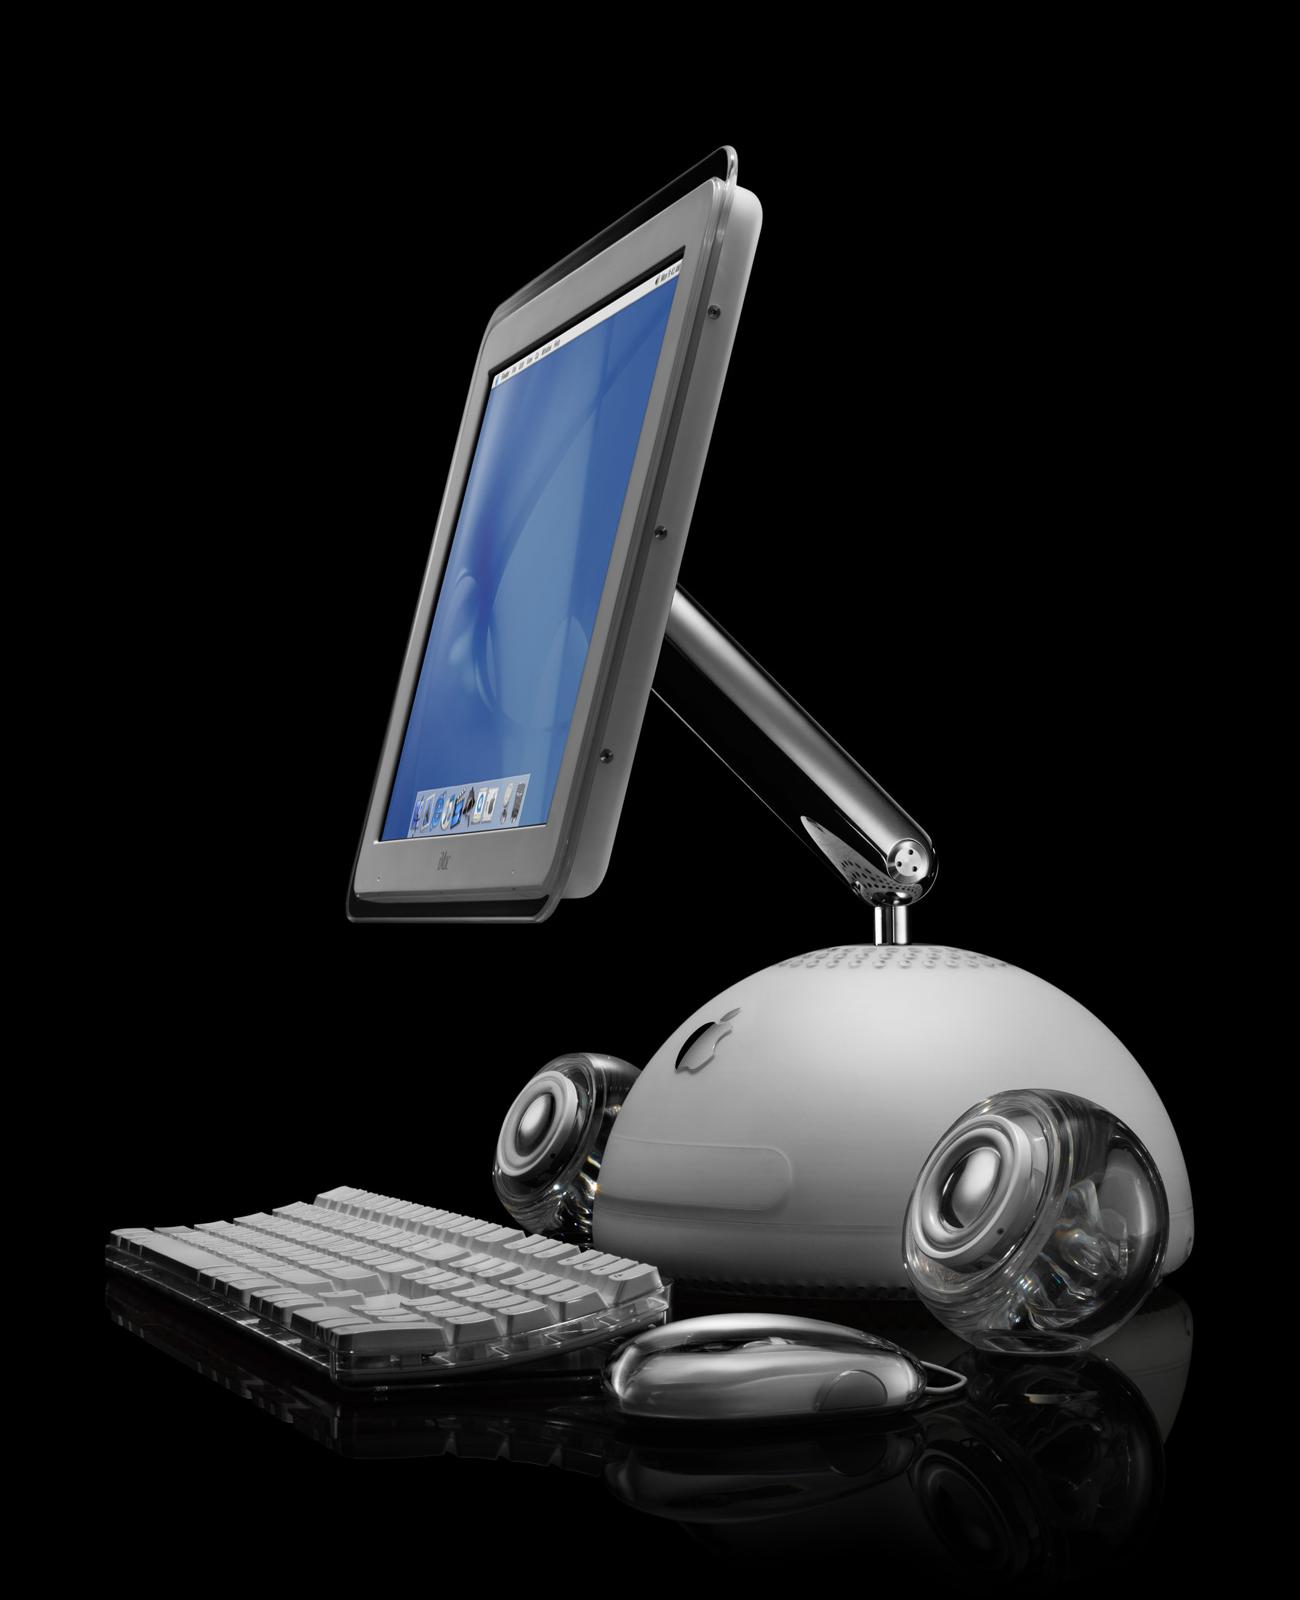 20020107_iMac